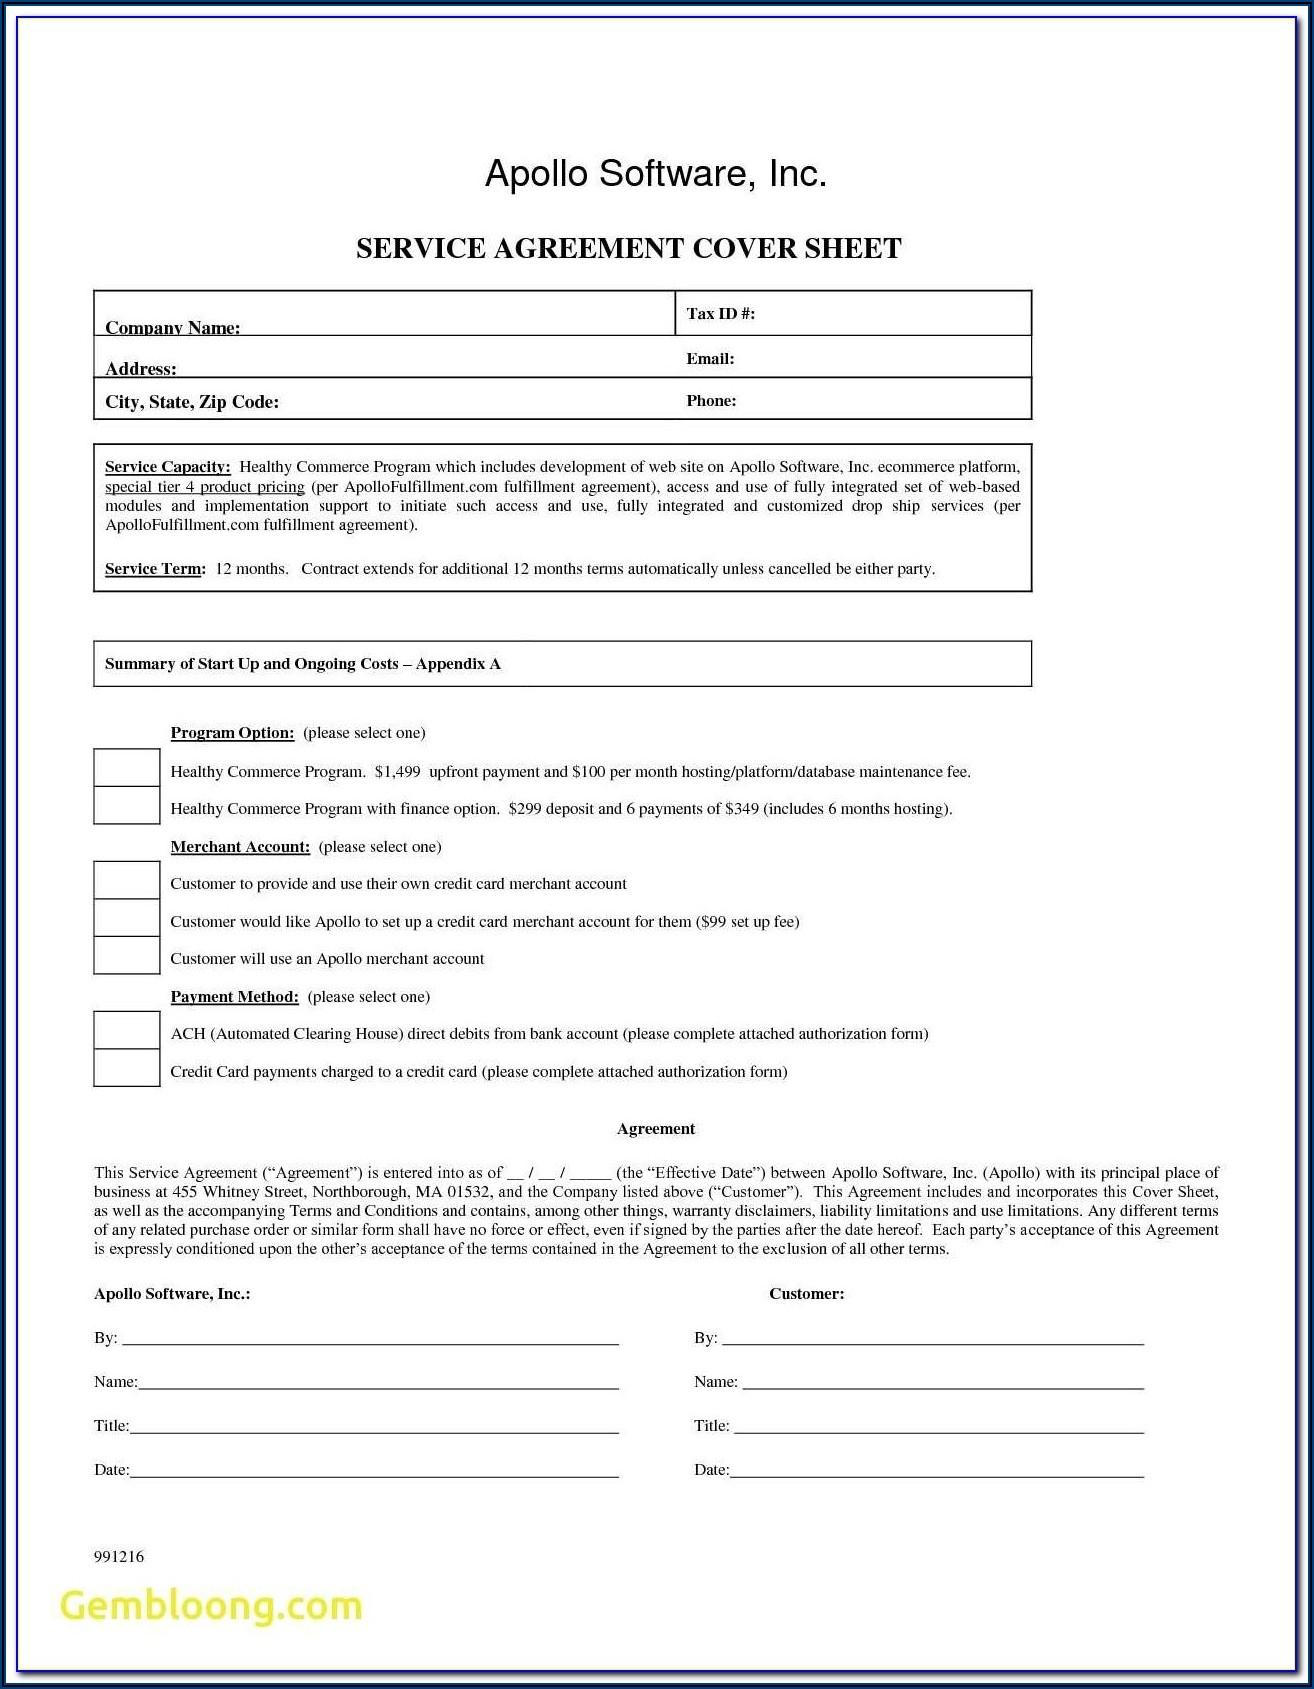 Ach Debit Authorization Form Chase